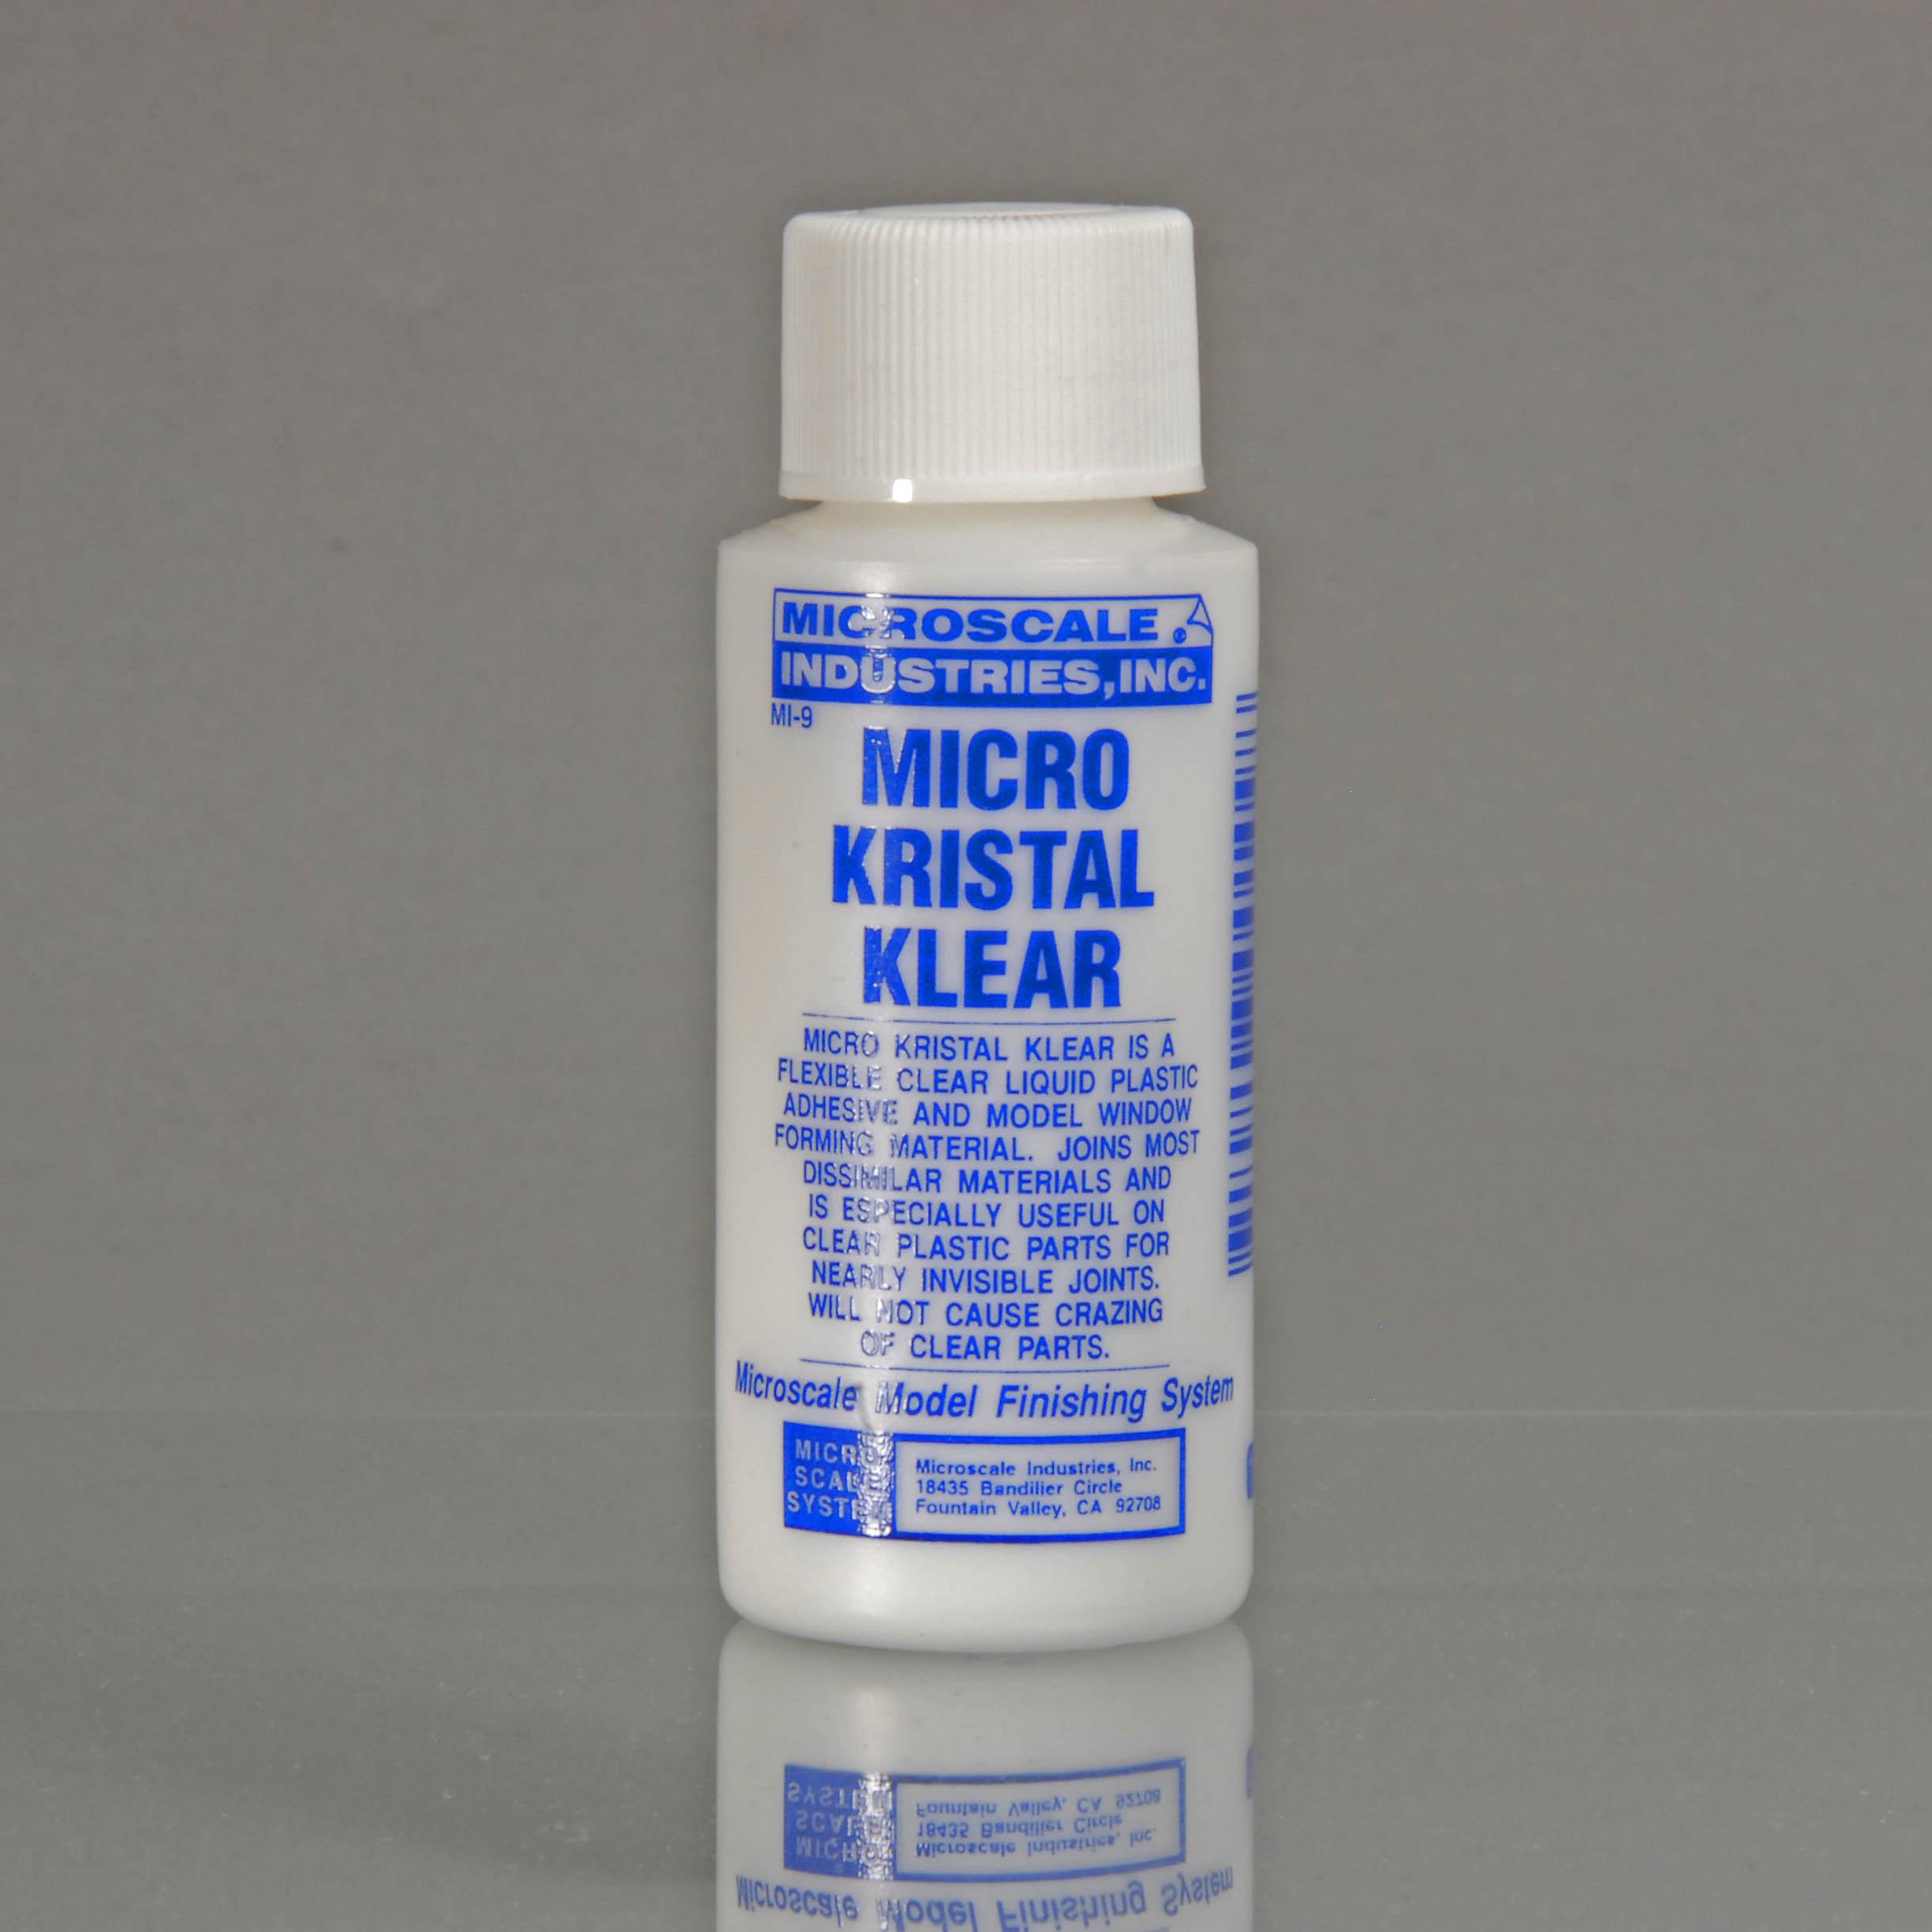 Micro Kristal Klear